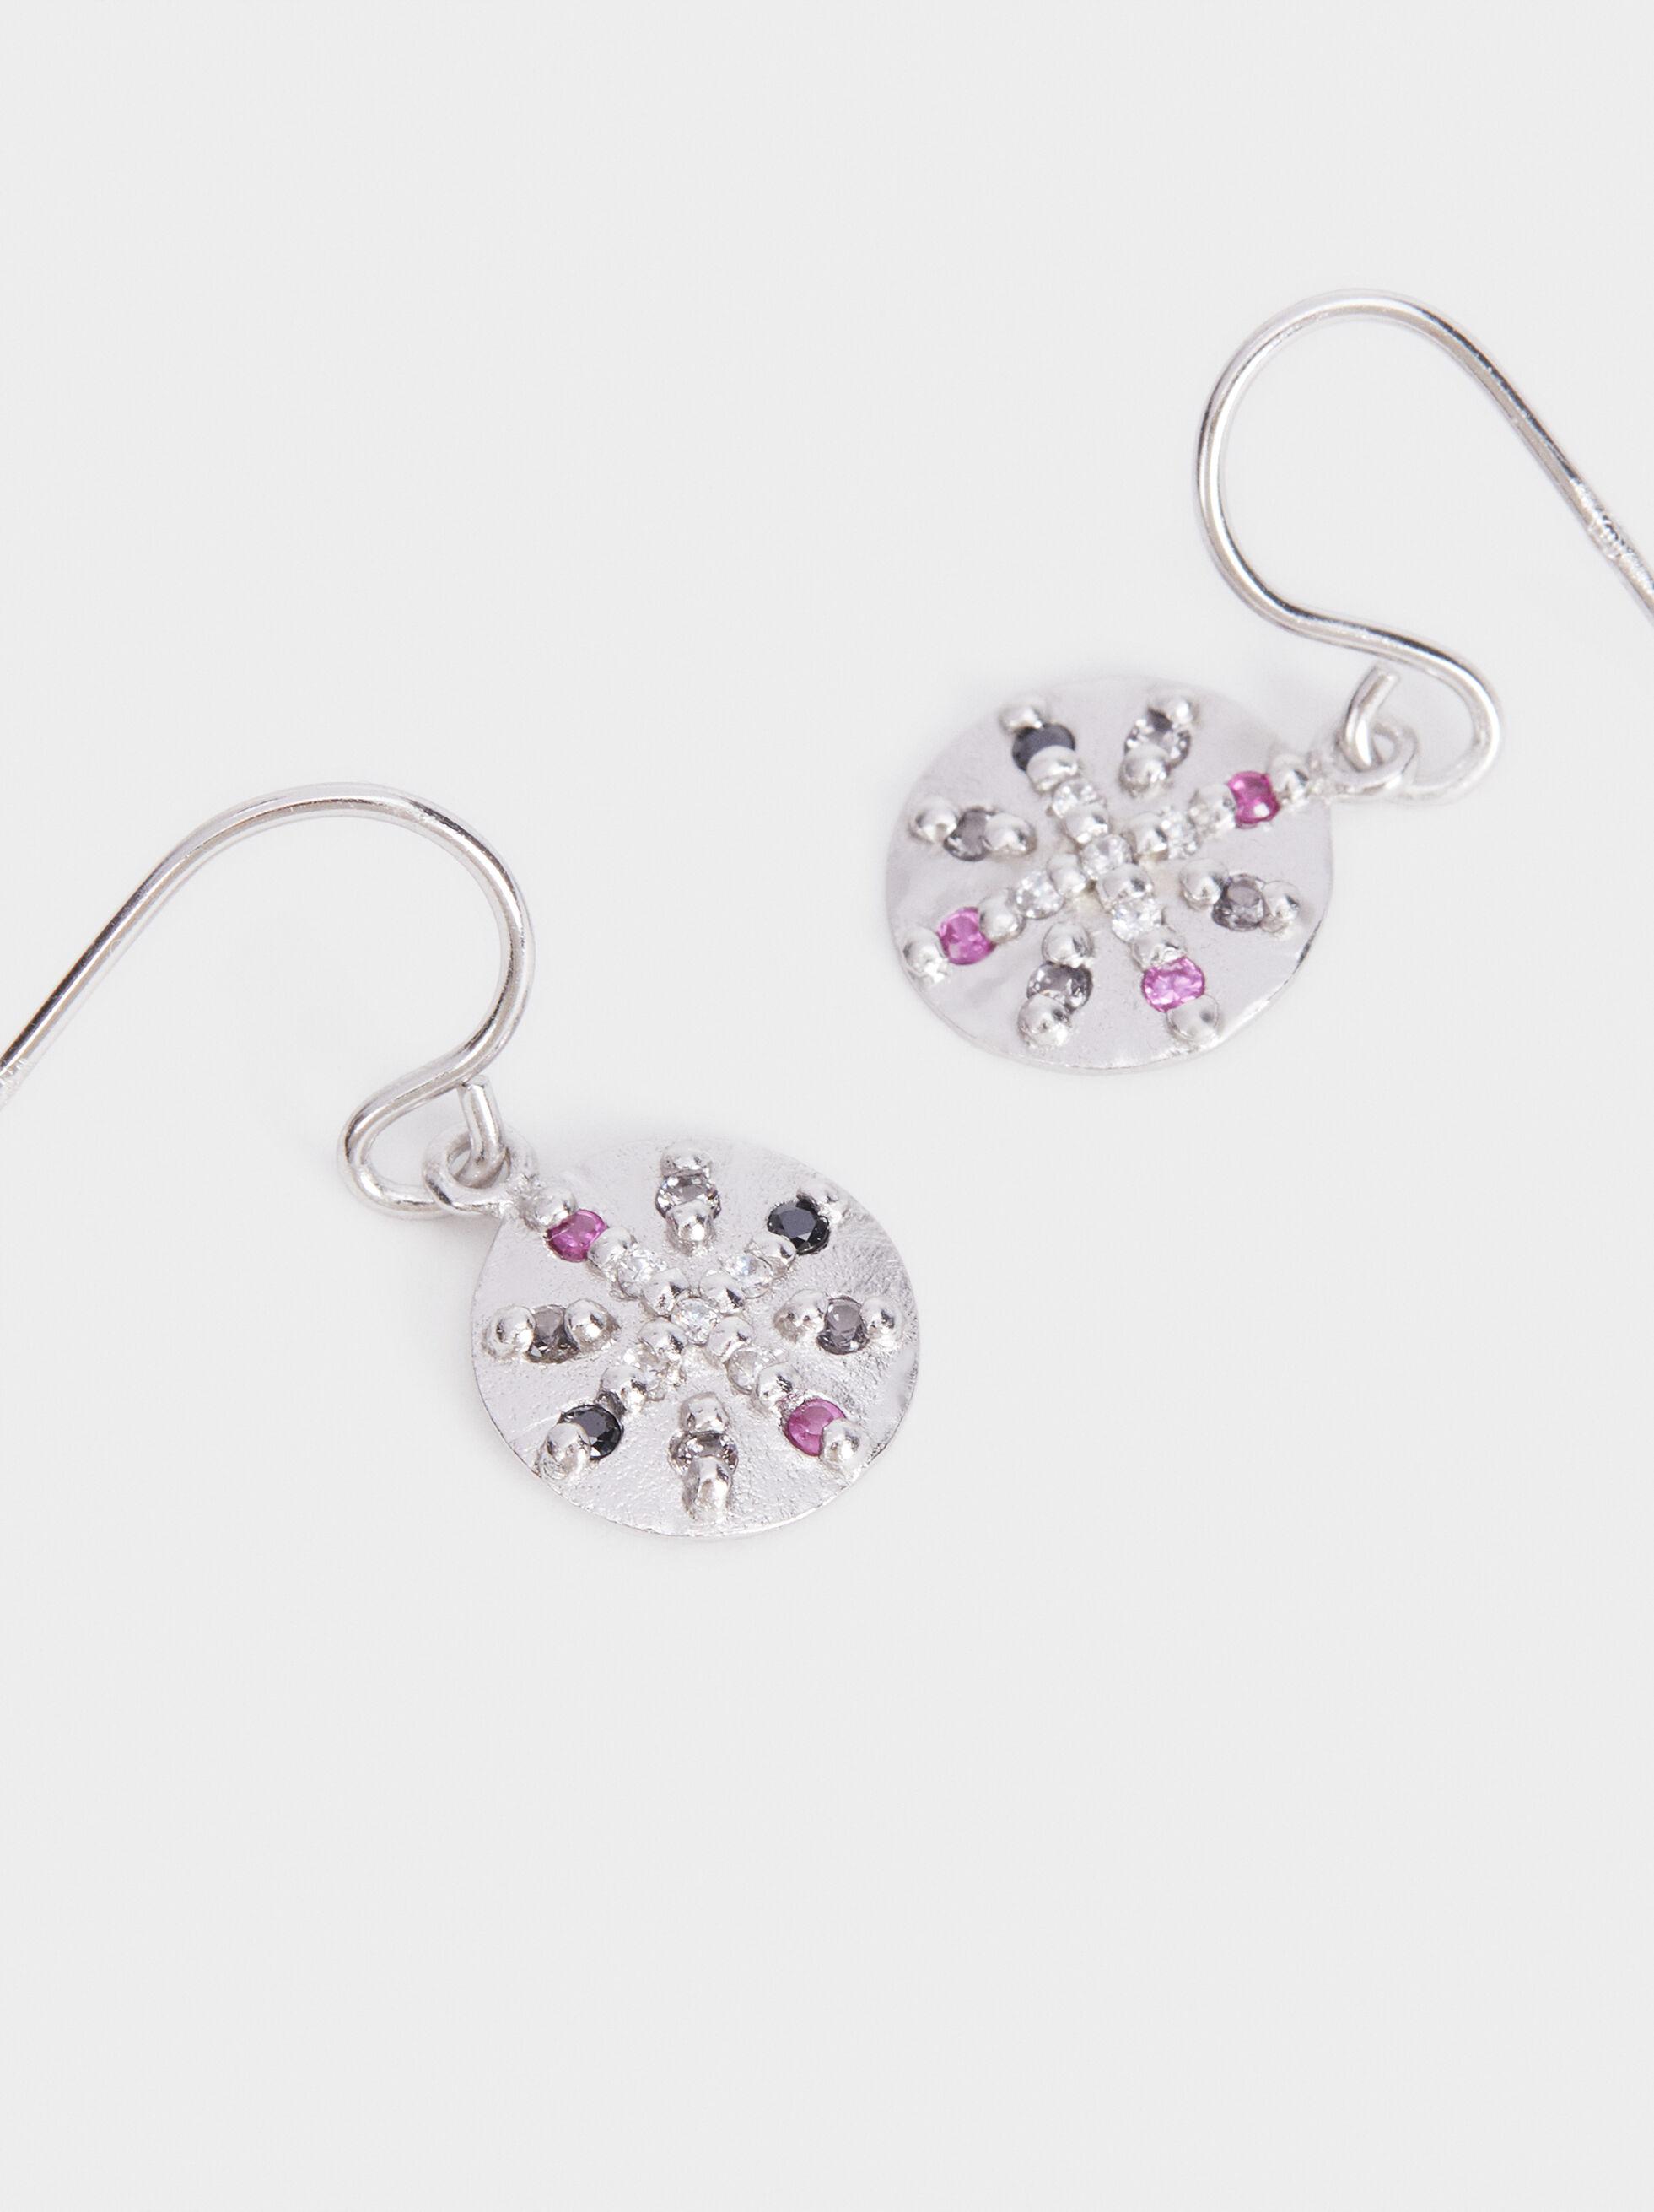 925 Silver Medium Rhinestone Earrings, Multicolor, hi-res